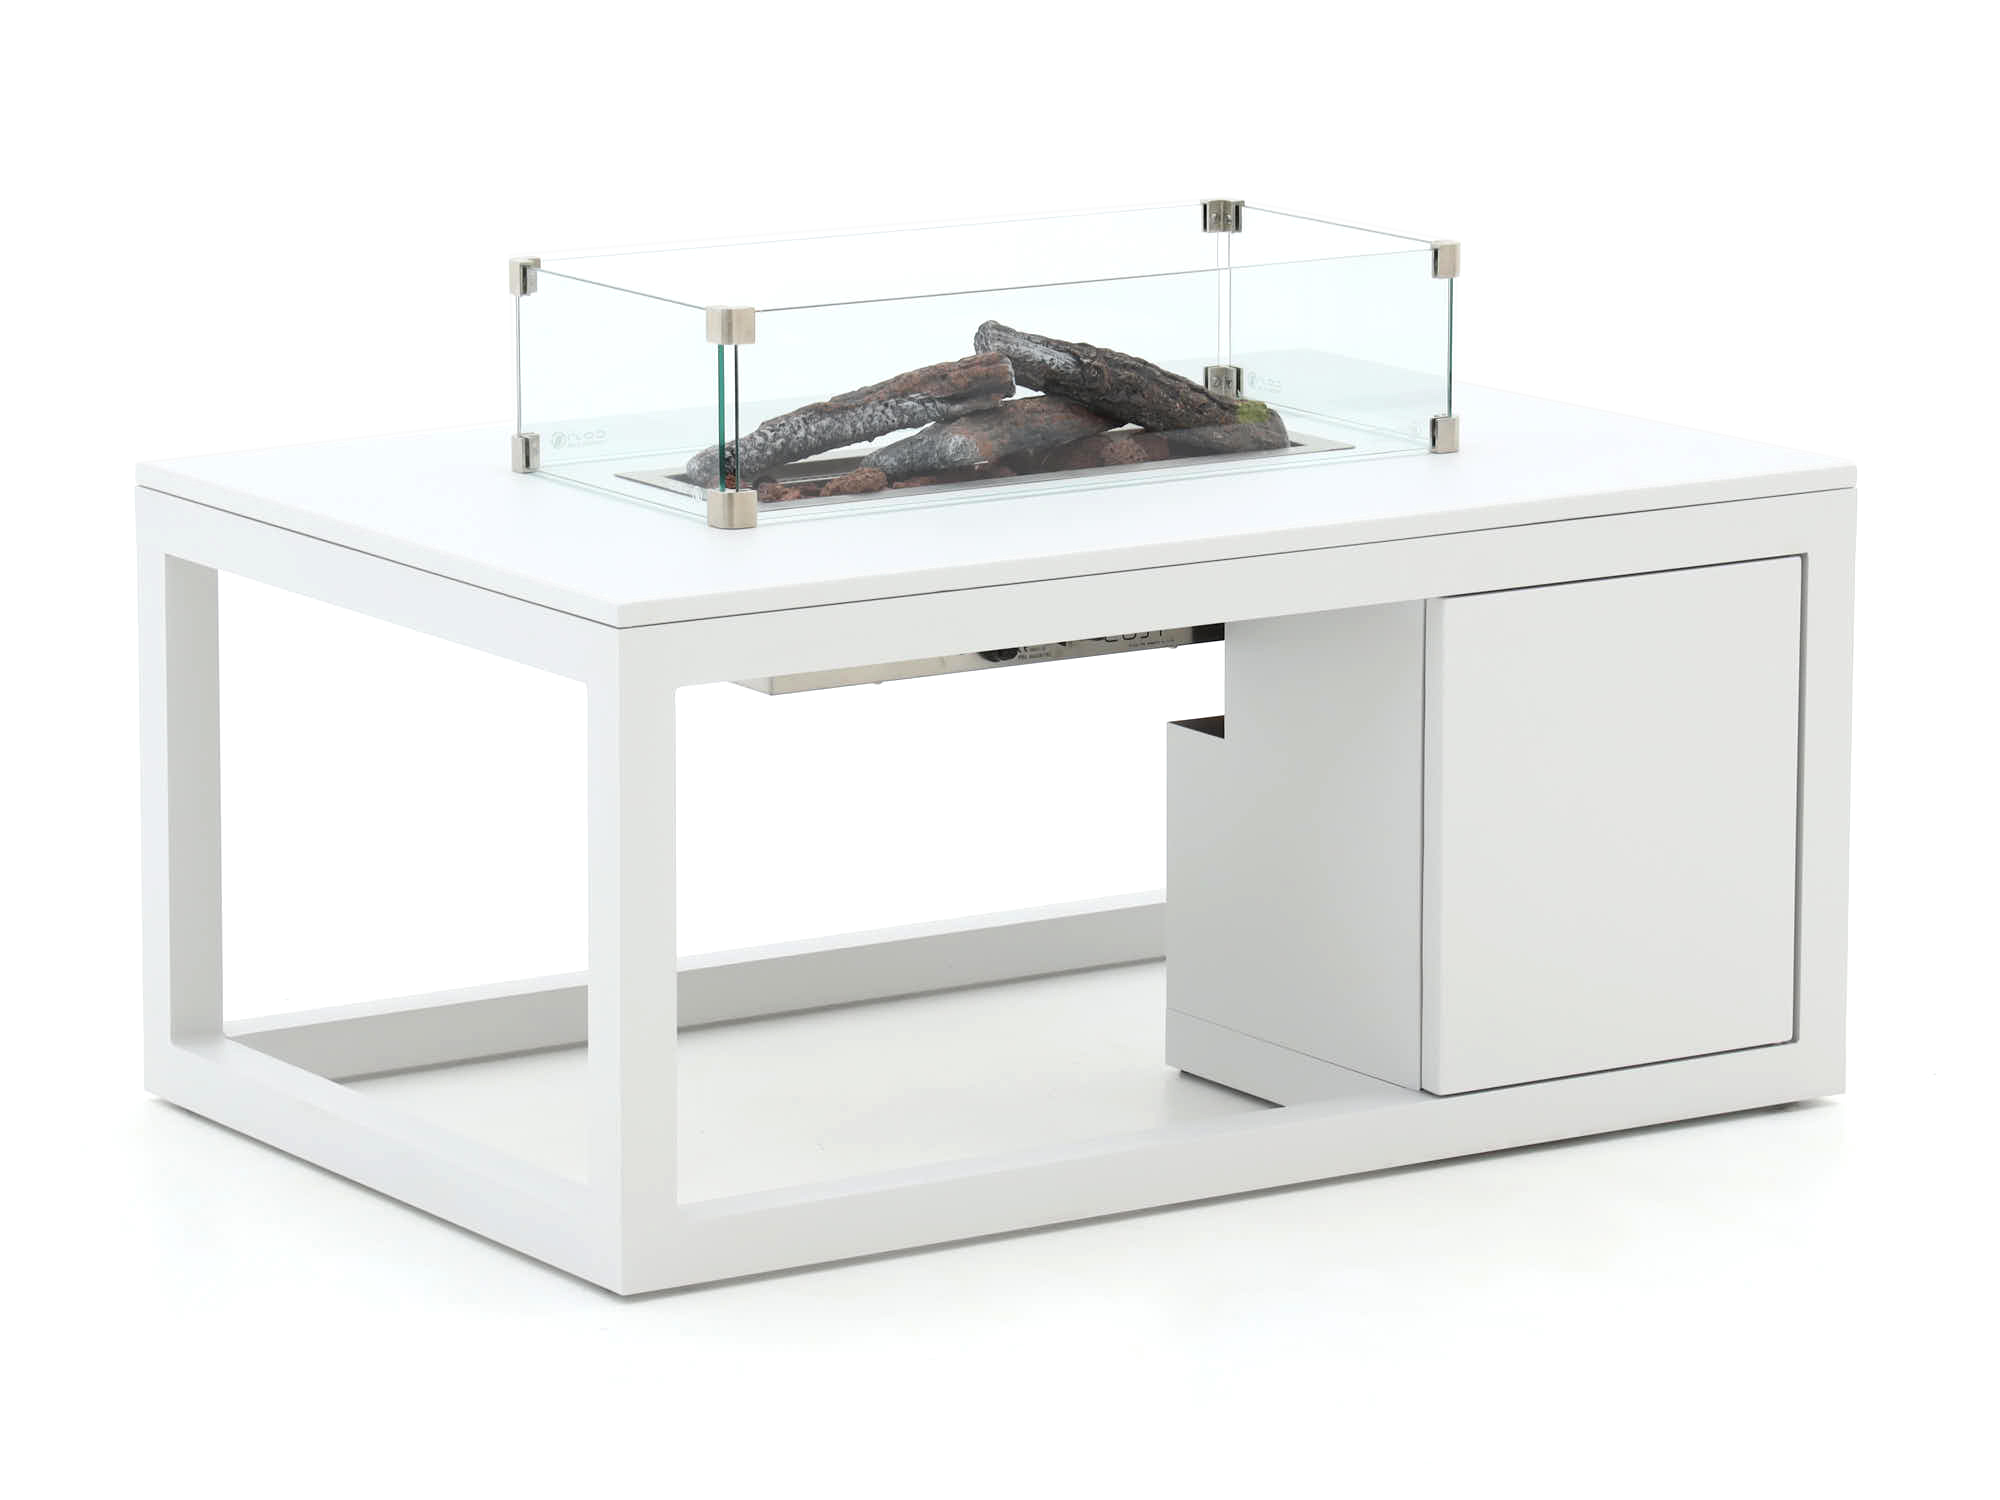 Cosiraw lounge vuurtafel 120x80x55cm - Laagste prijsgarantie!